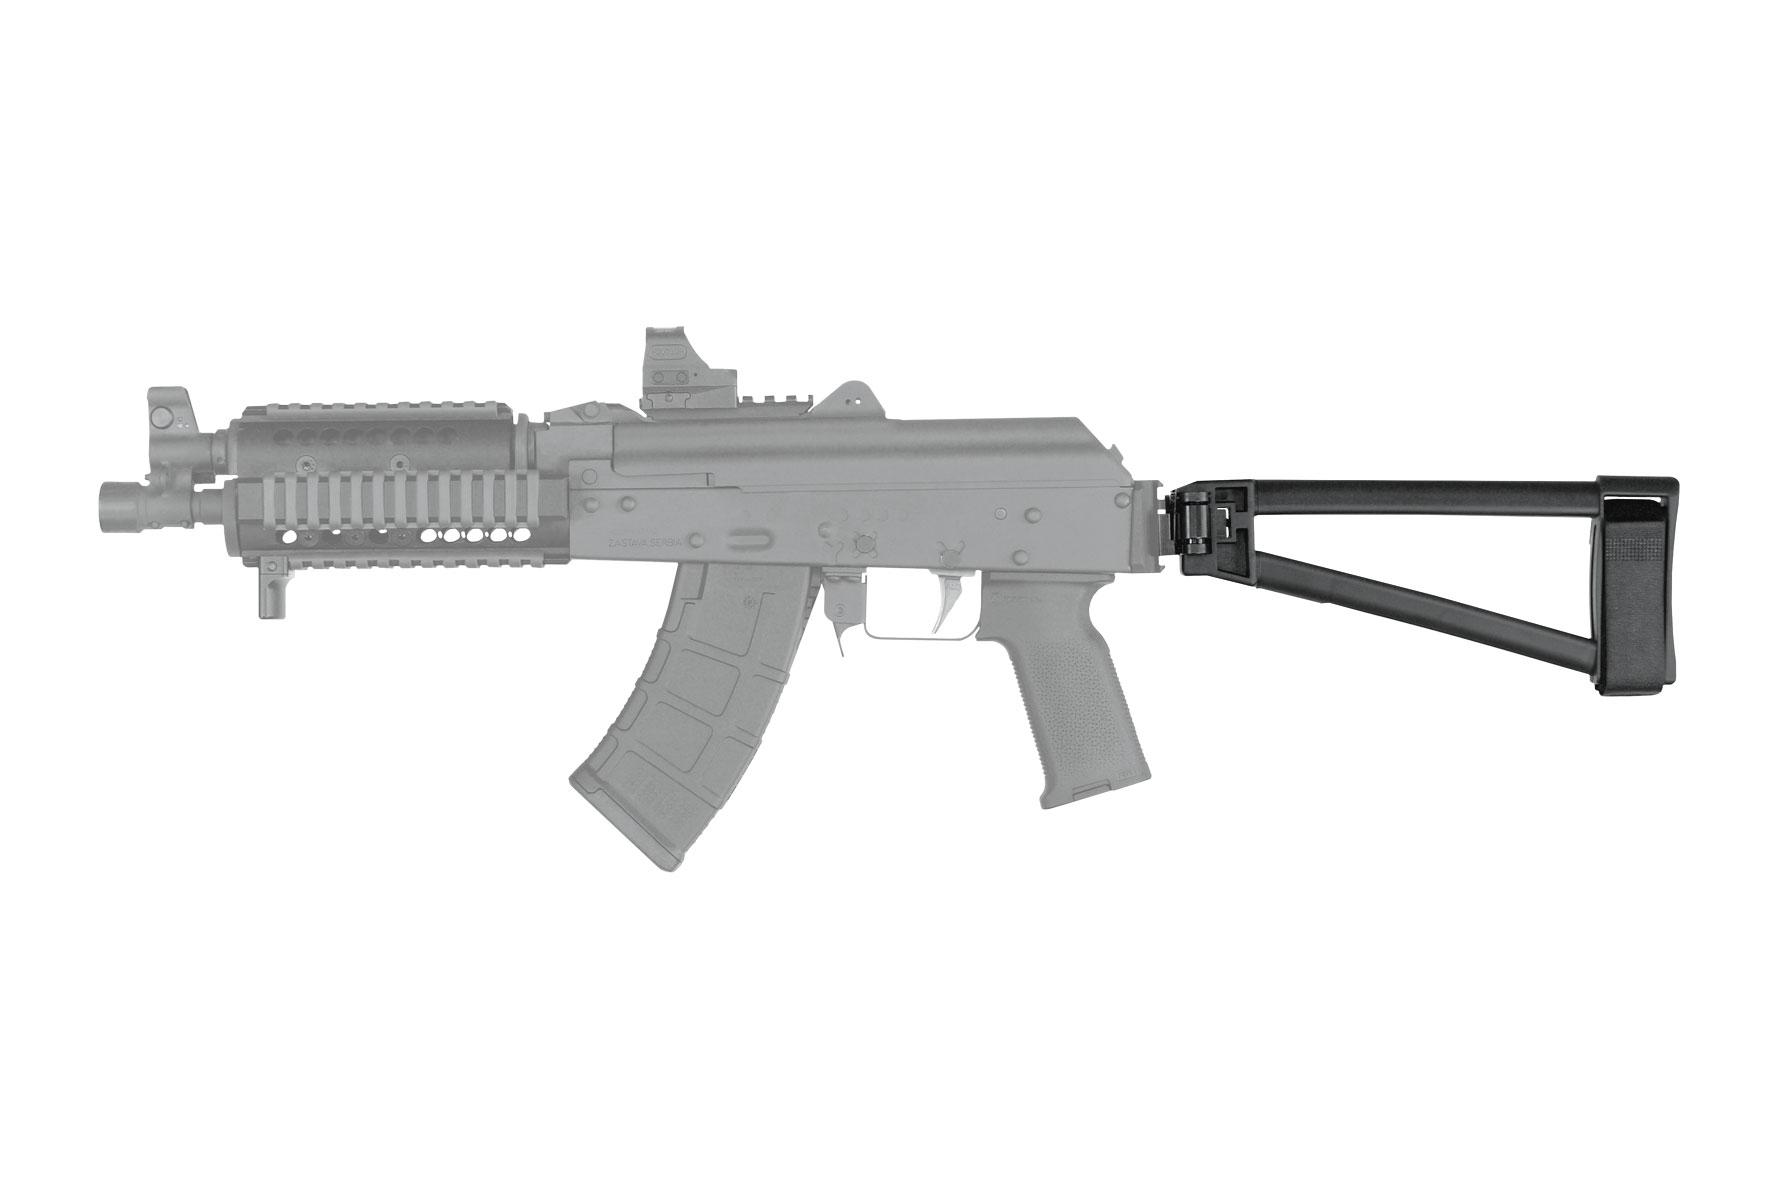 SB Tactical TF1913 Pistol Stabilizing Brace